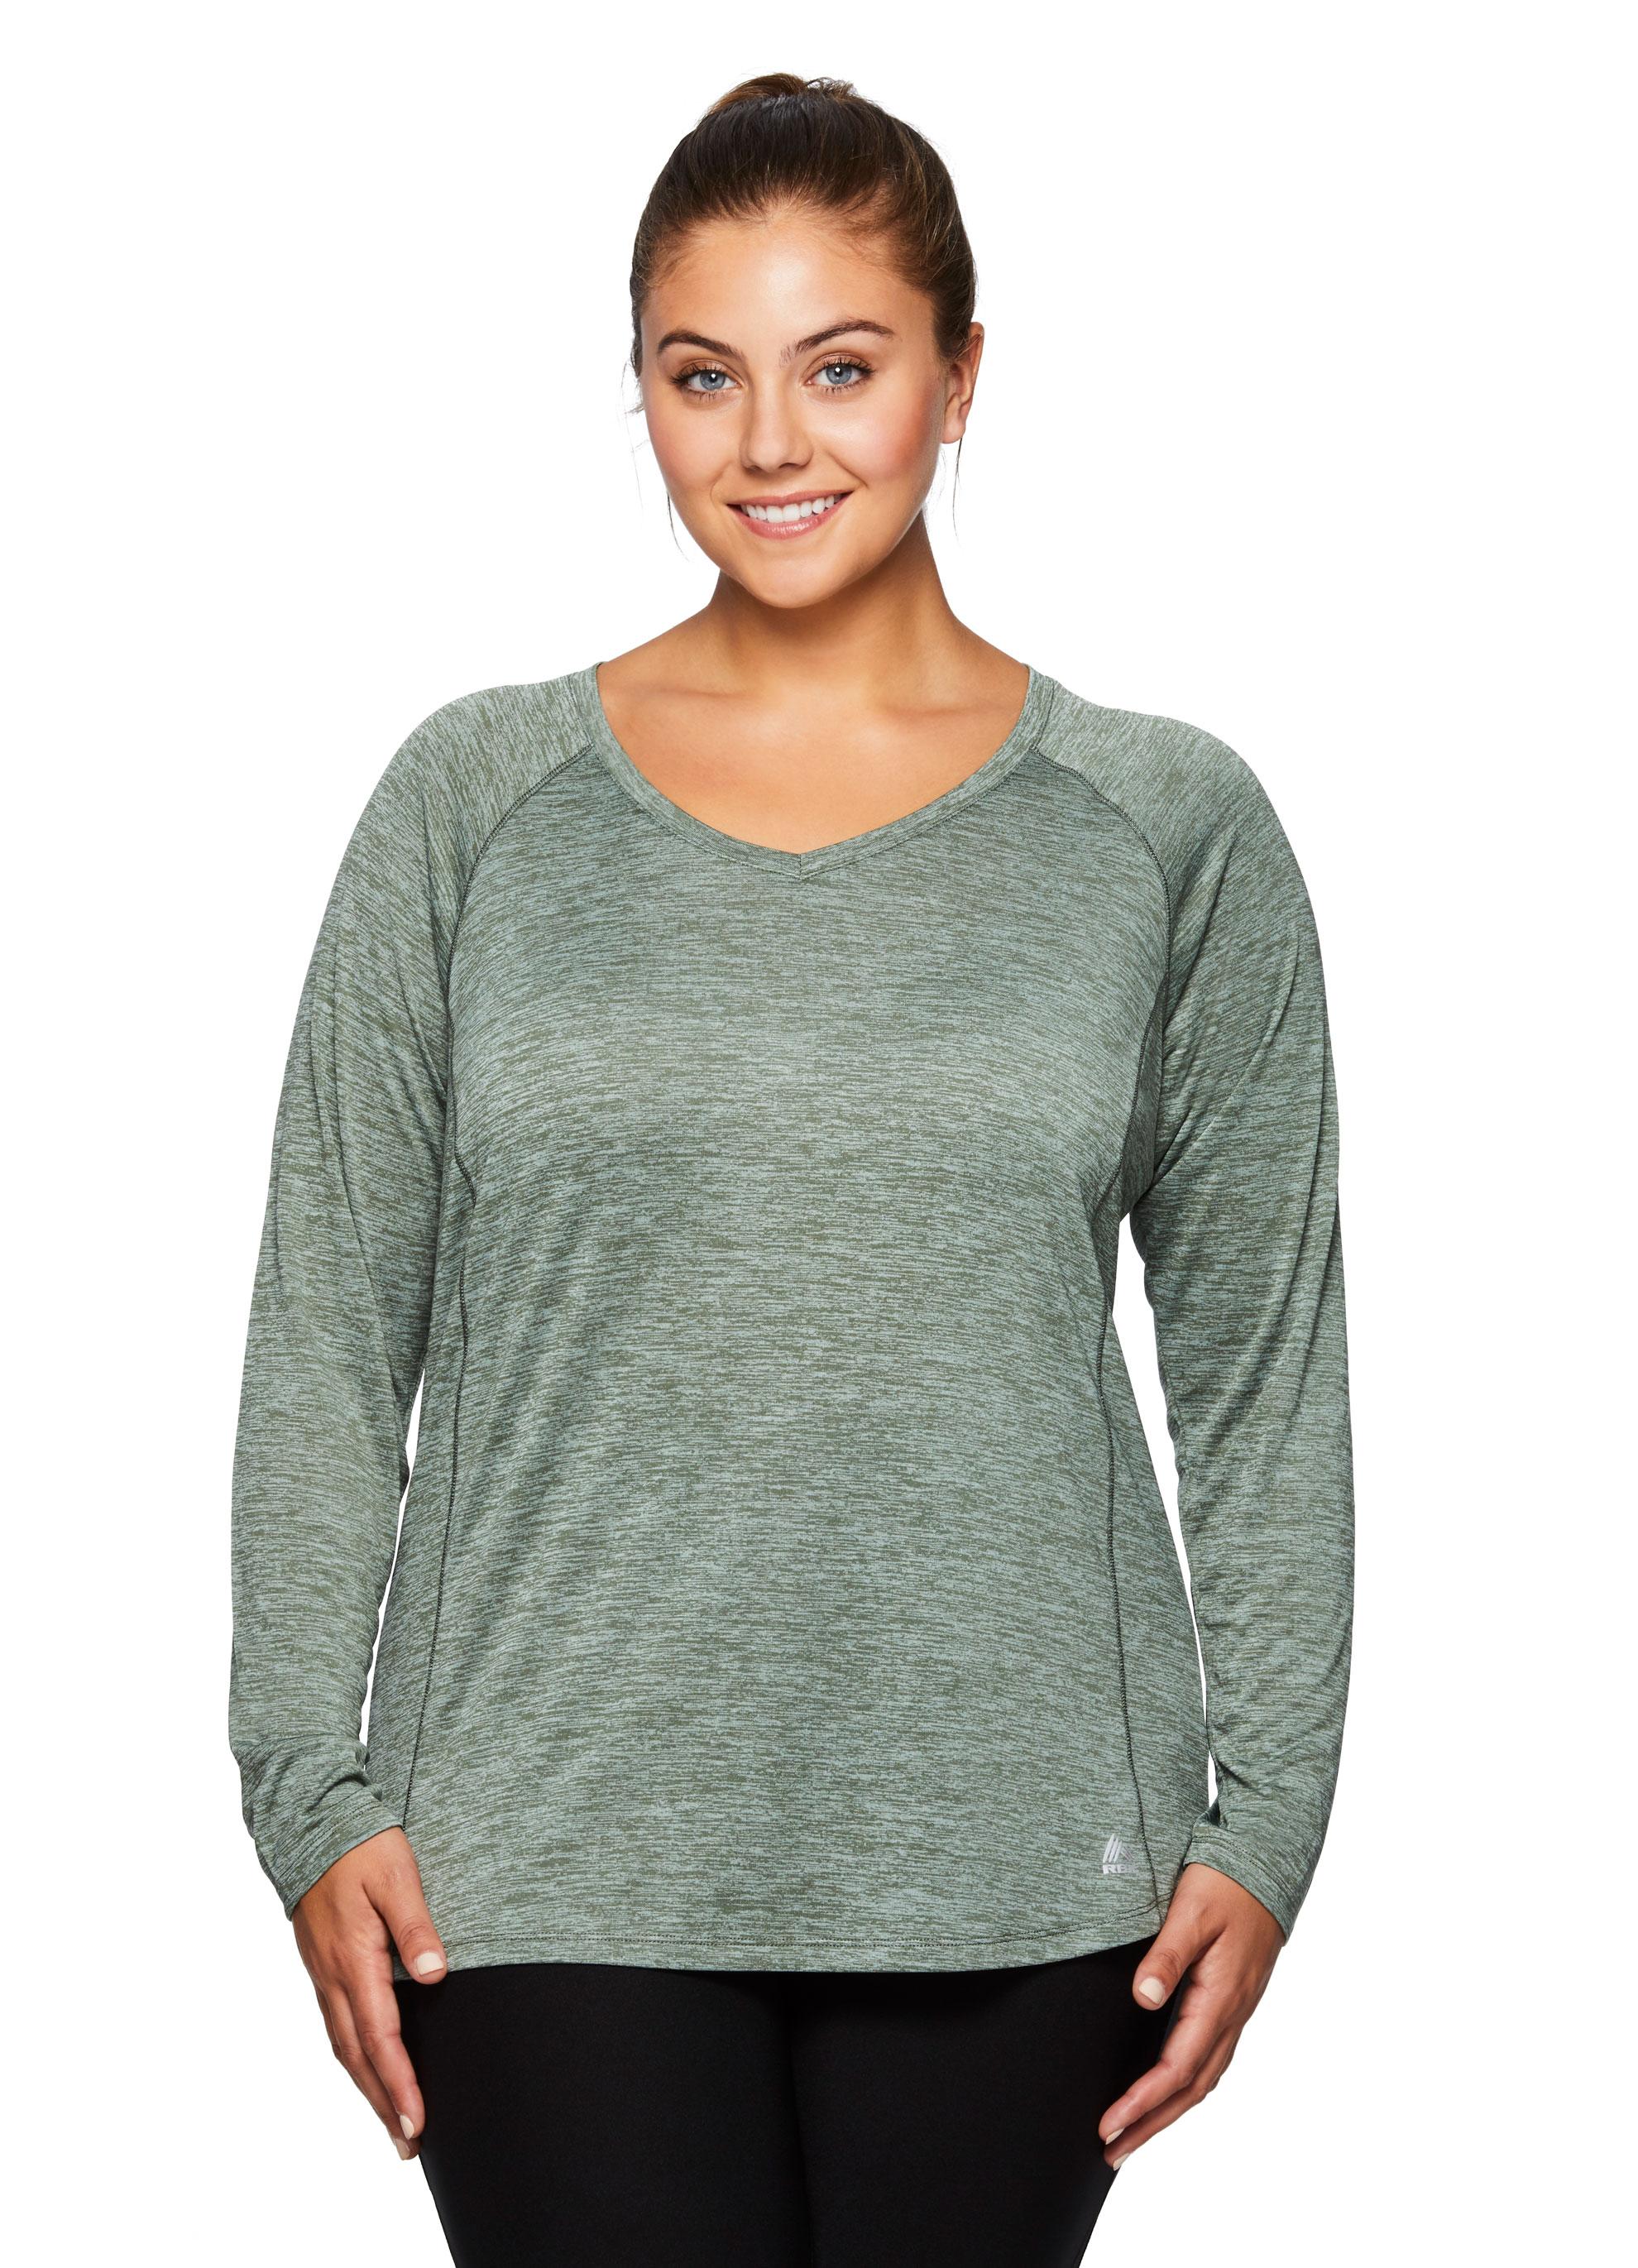 Rbx Active Women 39 S Plus Size Space Dye Long Sleeve V Neck